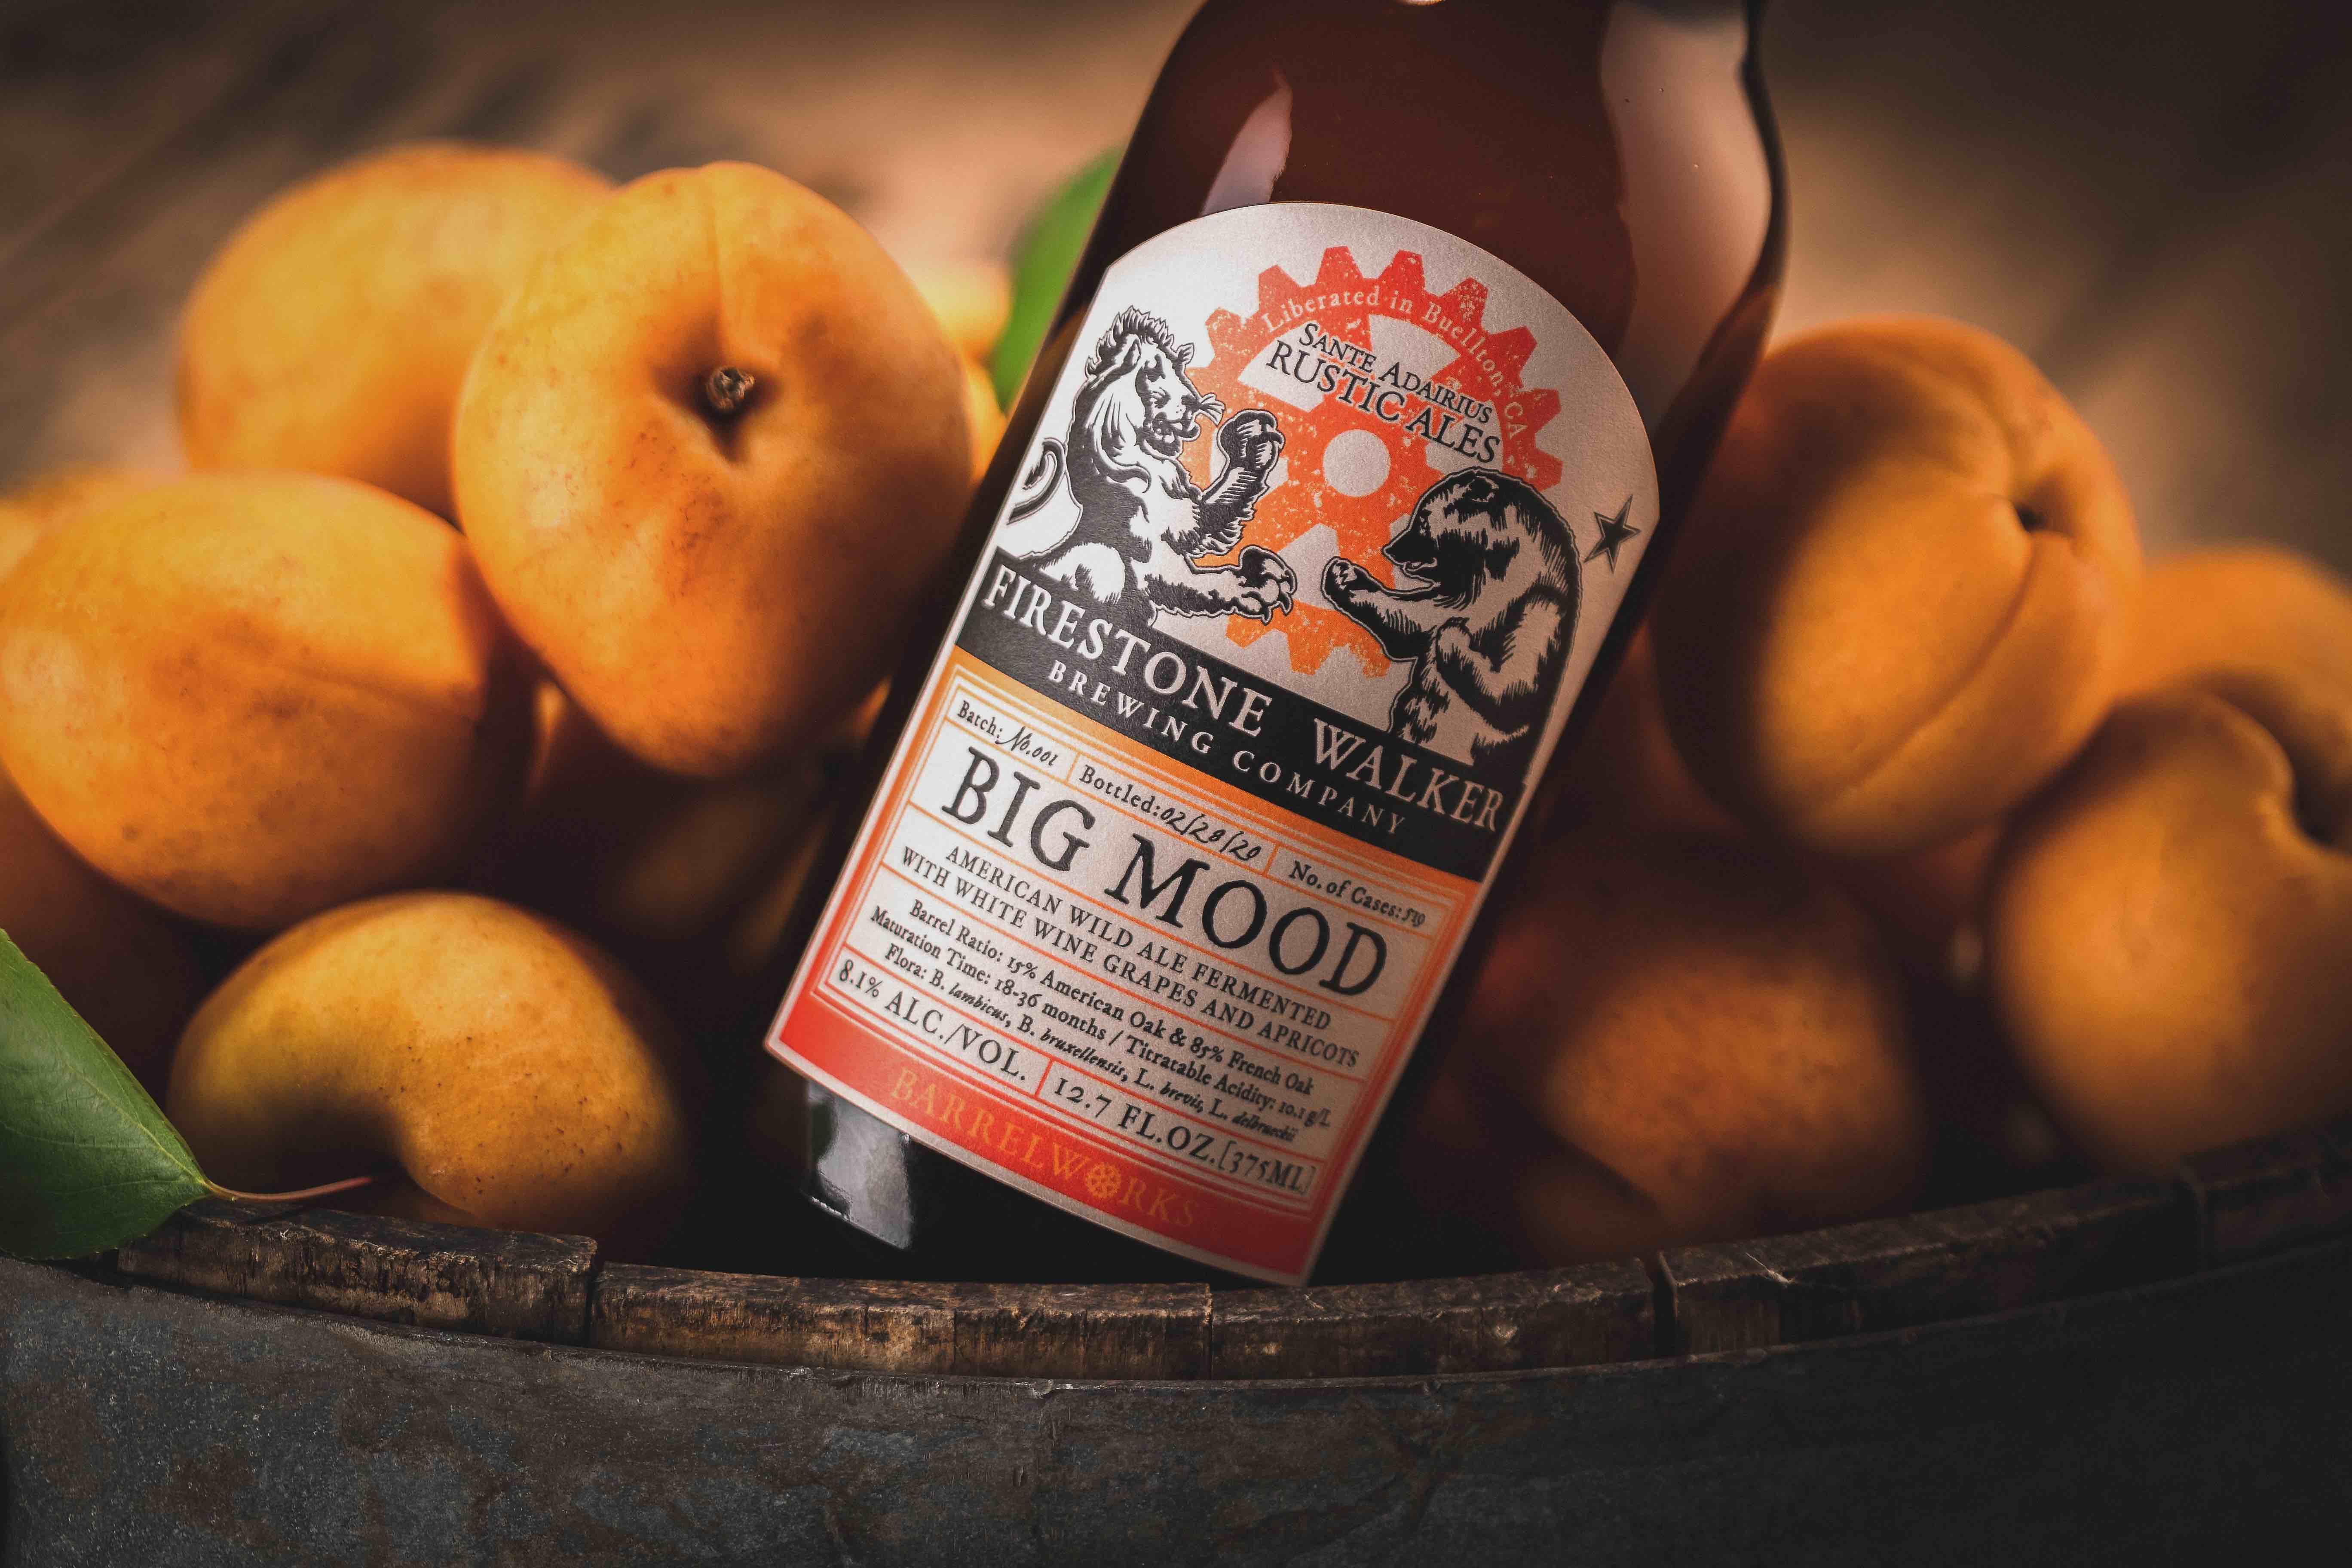 image of Big Mood courtesy of Firestone Walker Brewing